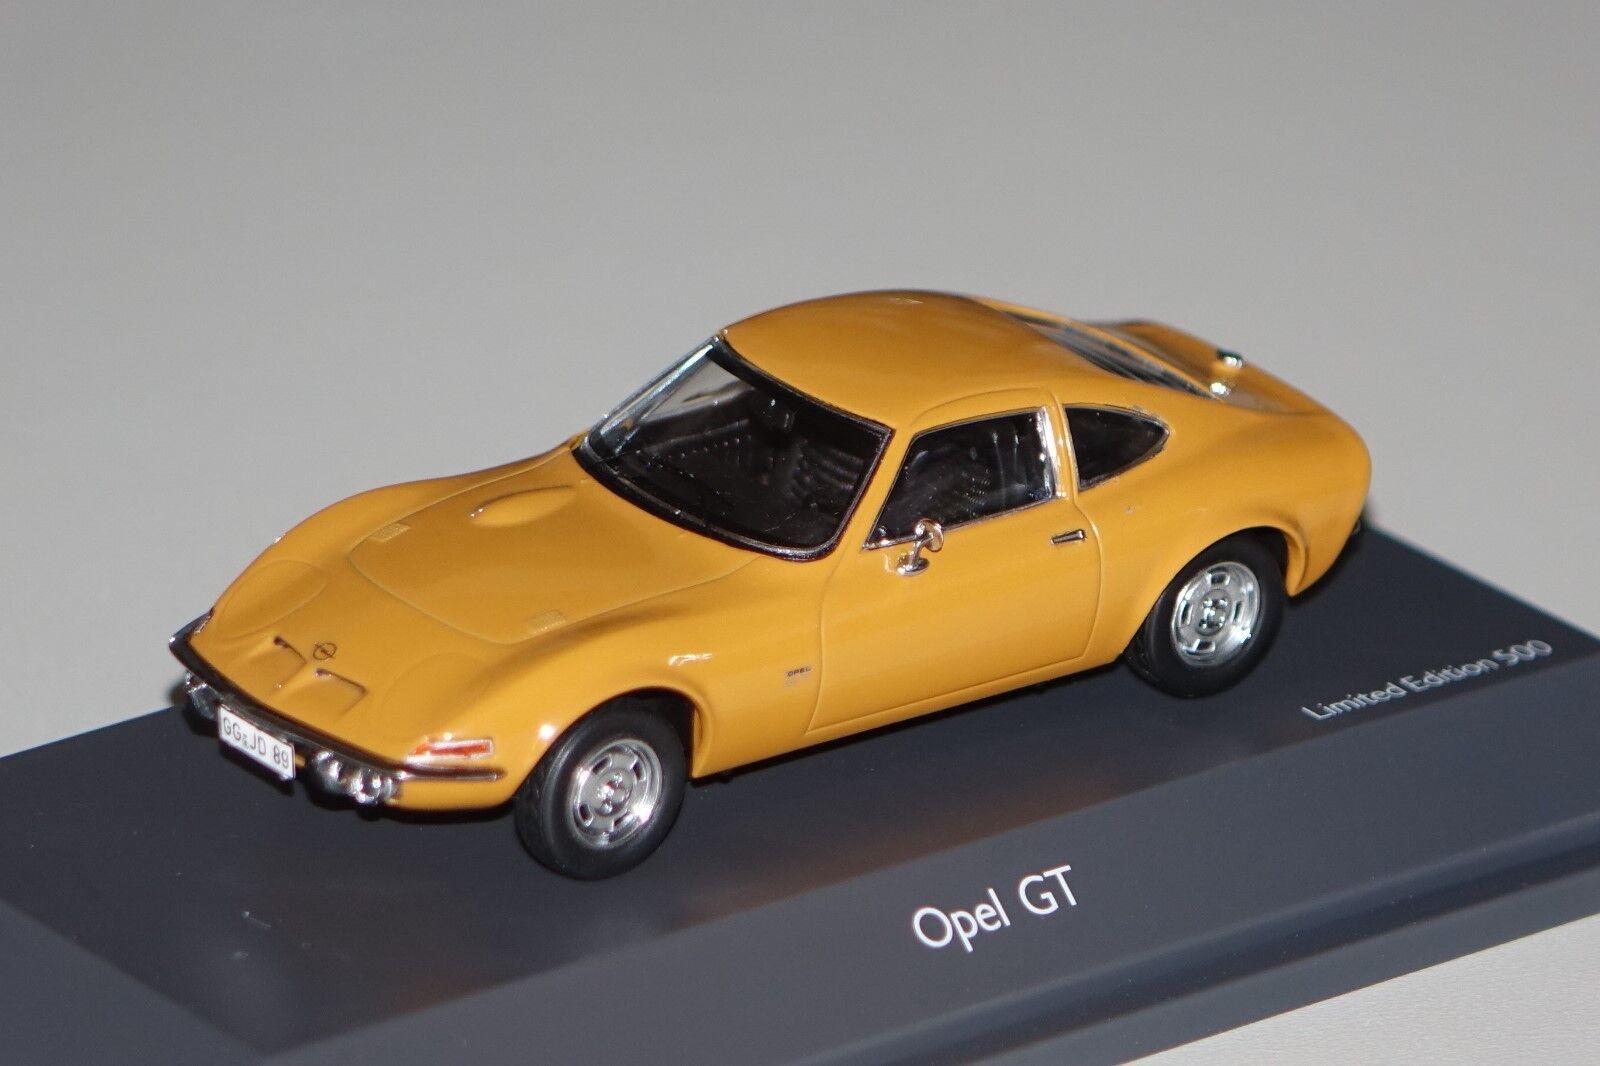 Opel GT Orange 1 43 Schuco NOUVEAU & NEUF dans sa boîte 450256700